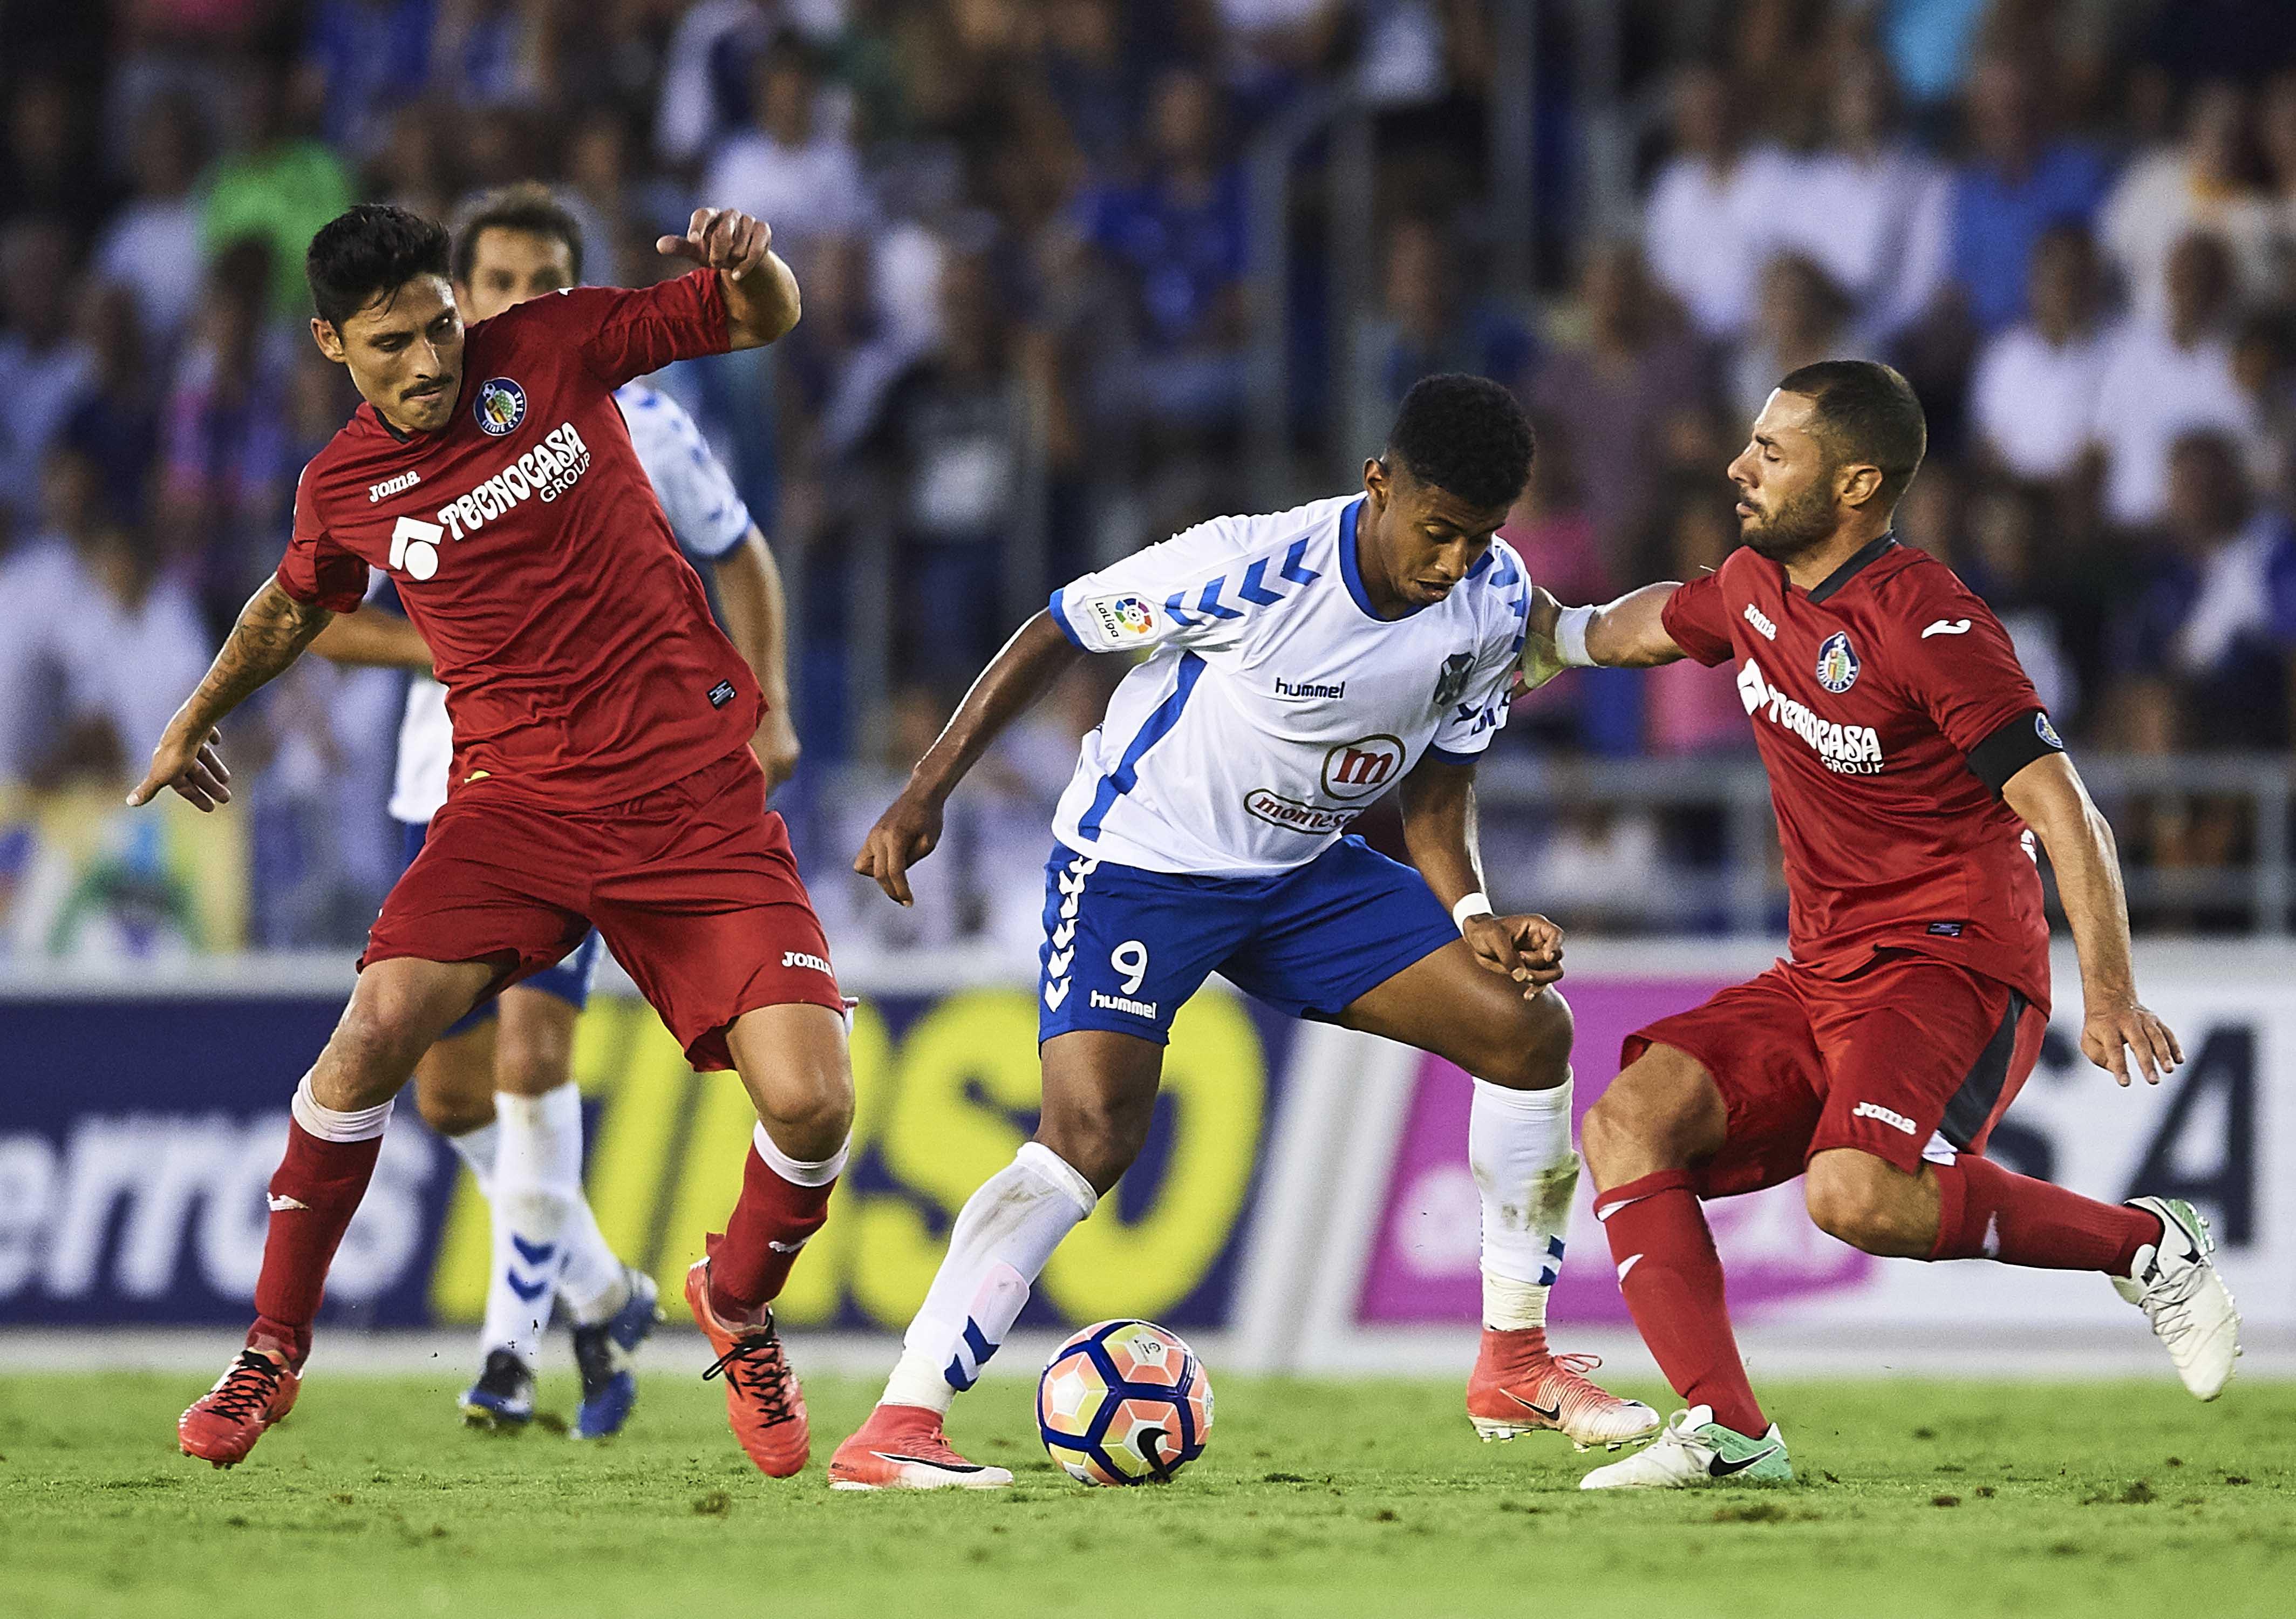 Getafe vs Tenerife: a un paso del regreso a la élite